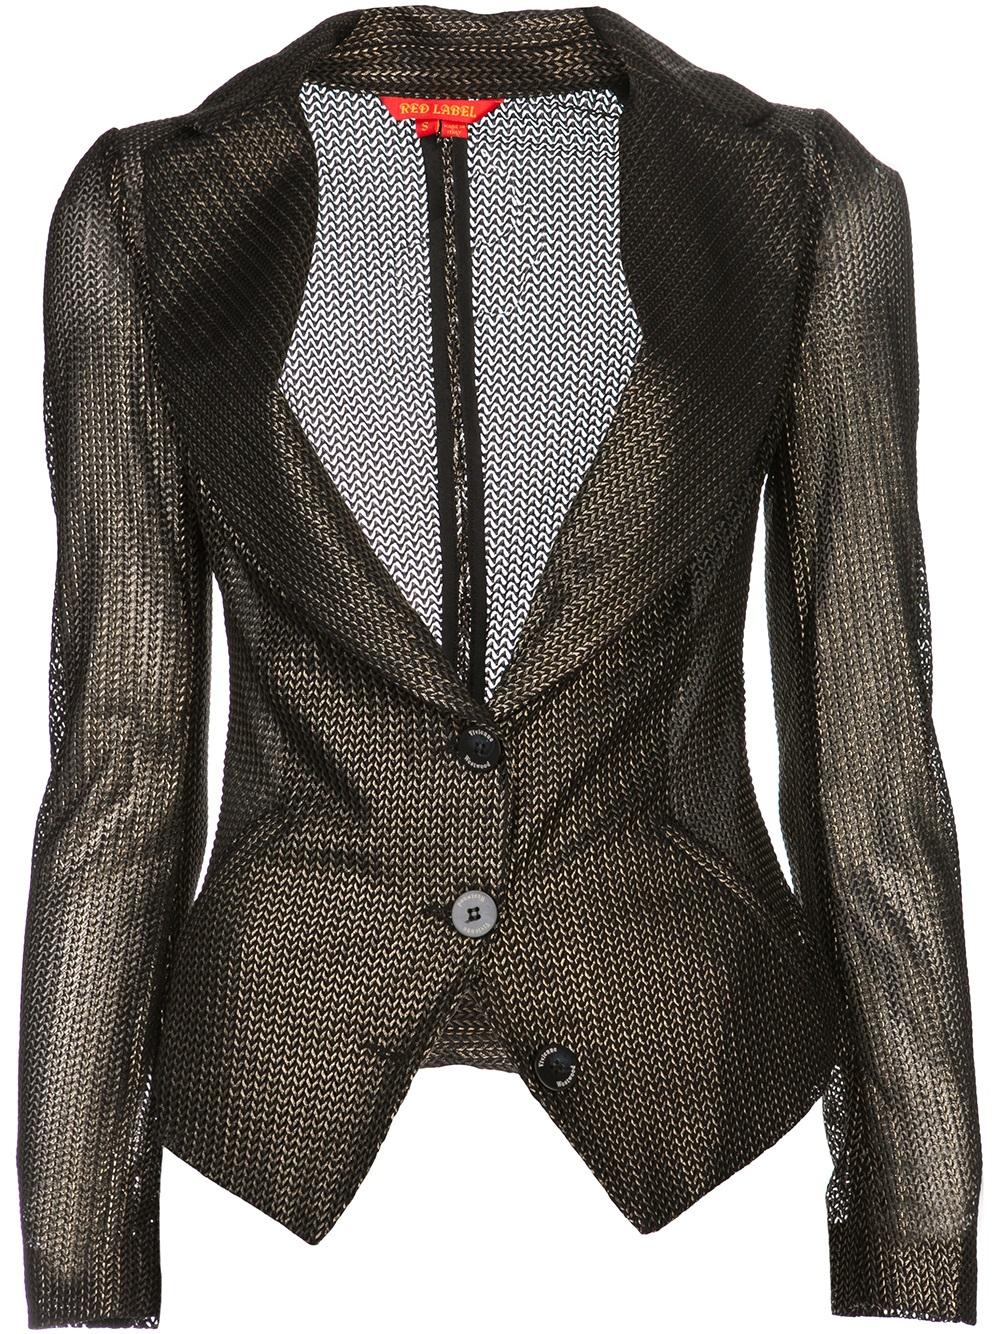 Lyst Vivienne Westwood Red Label Chainmail Jacket In Brown